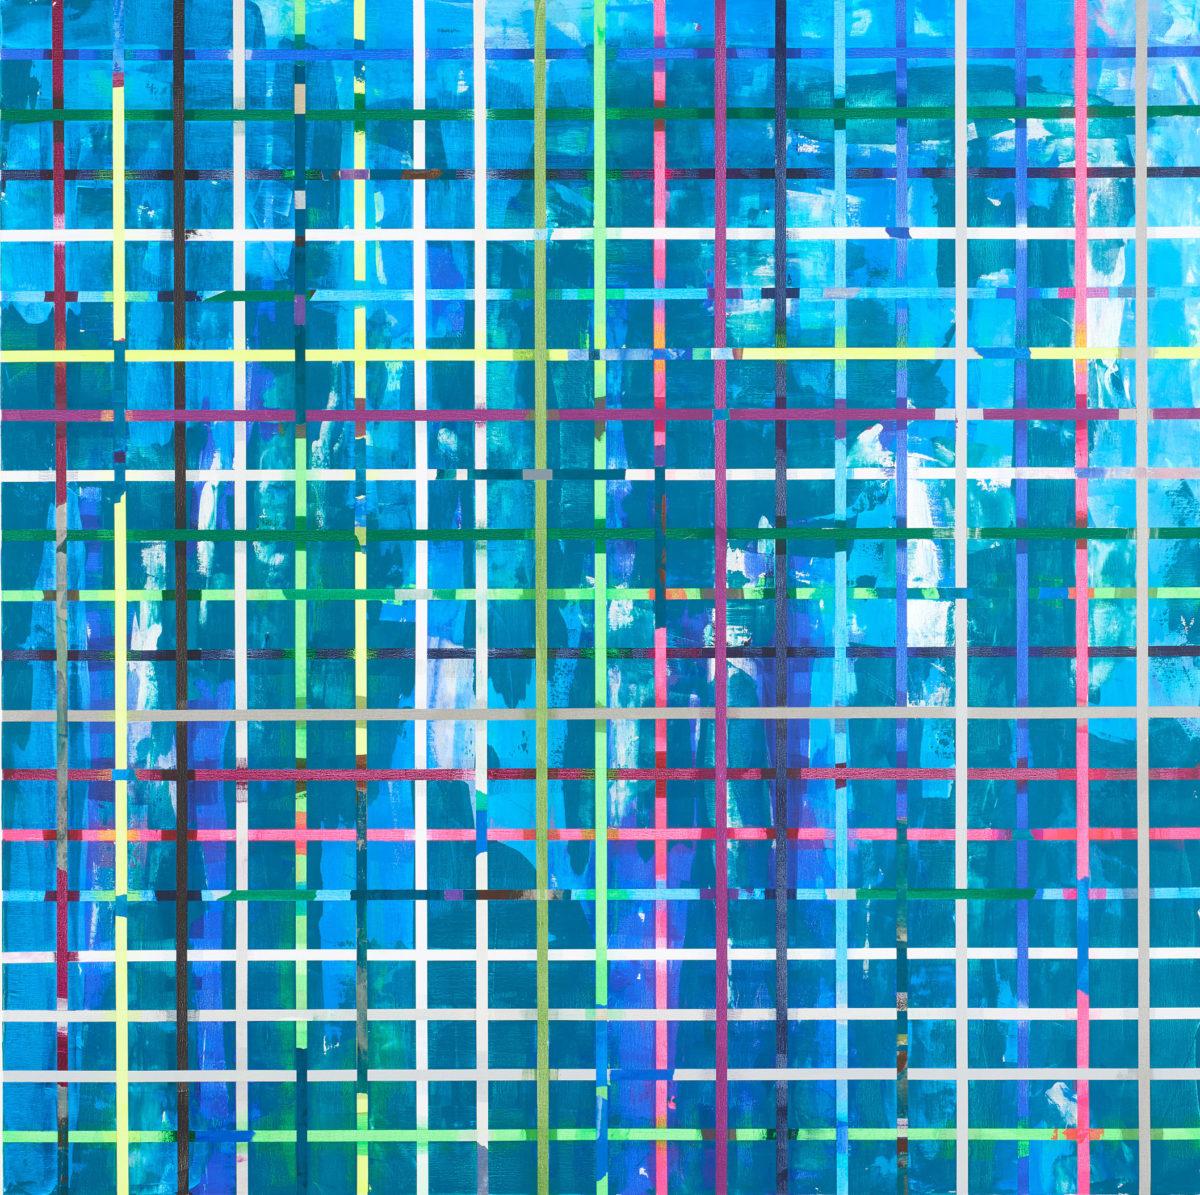 Zobernig Heimo, Ohne Titel, Acryl auf Leinwand, collagiert, 2017